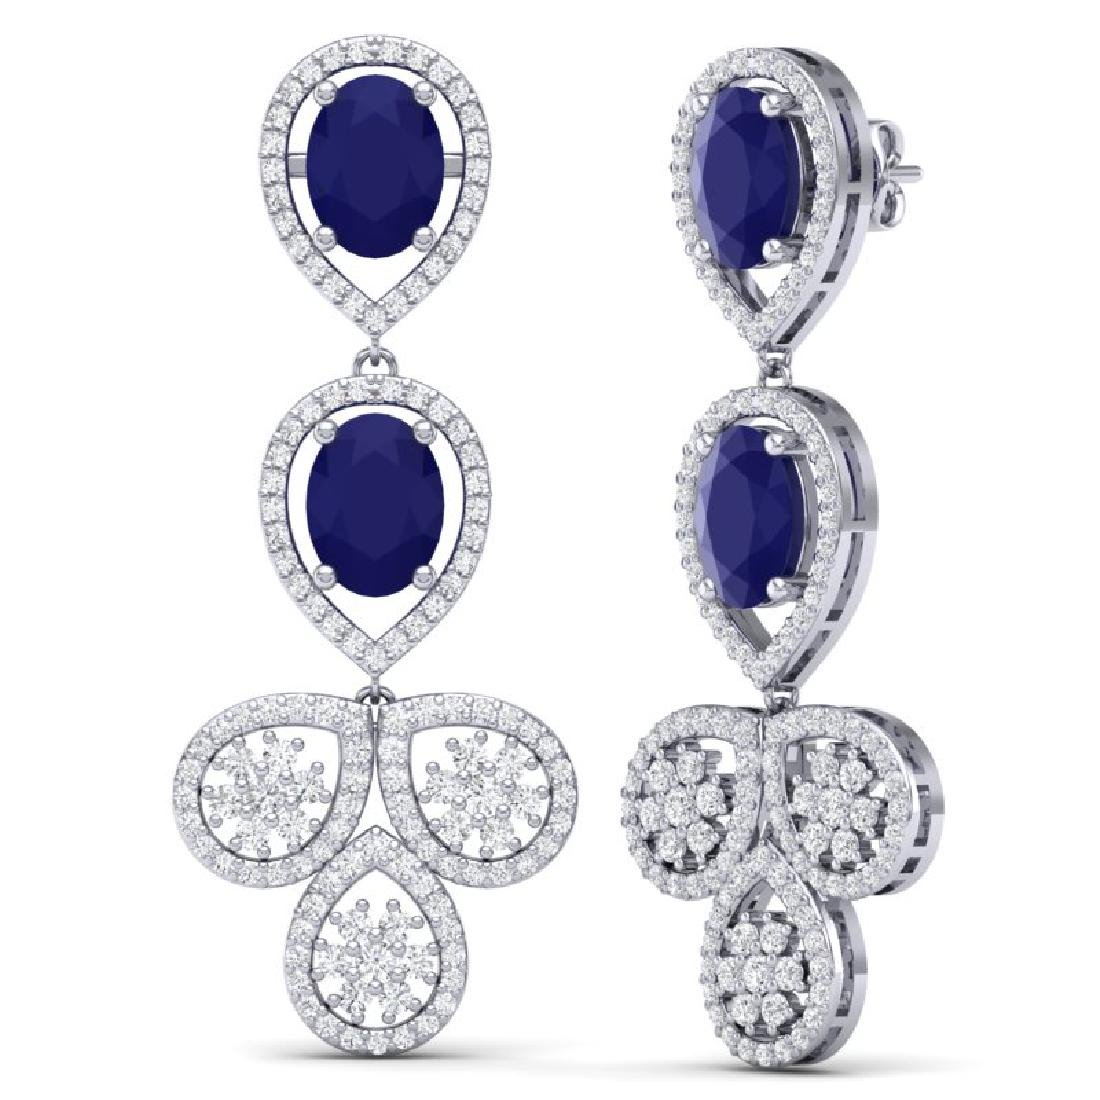 9.75 CTW Royalty Sapphire & VS Diamond Earrings 18K - 3